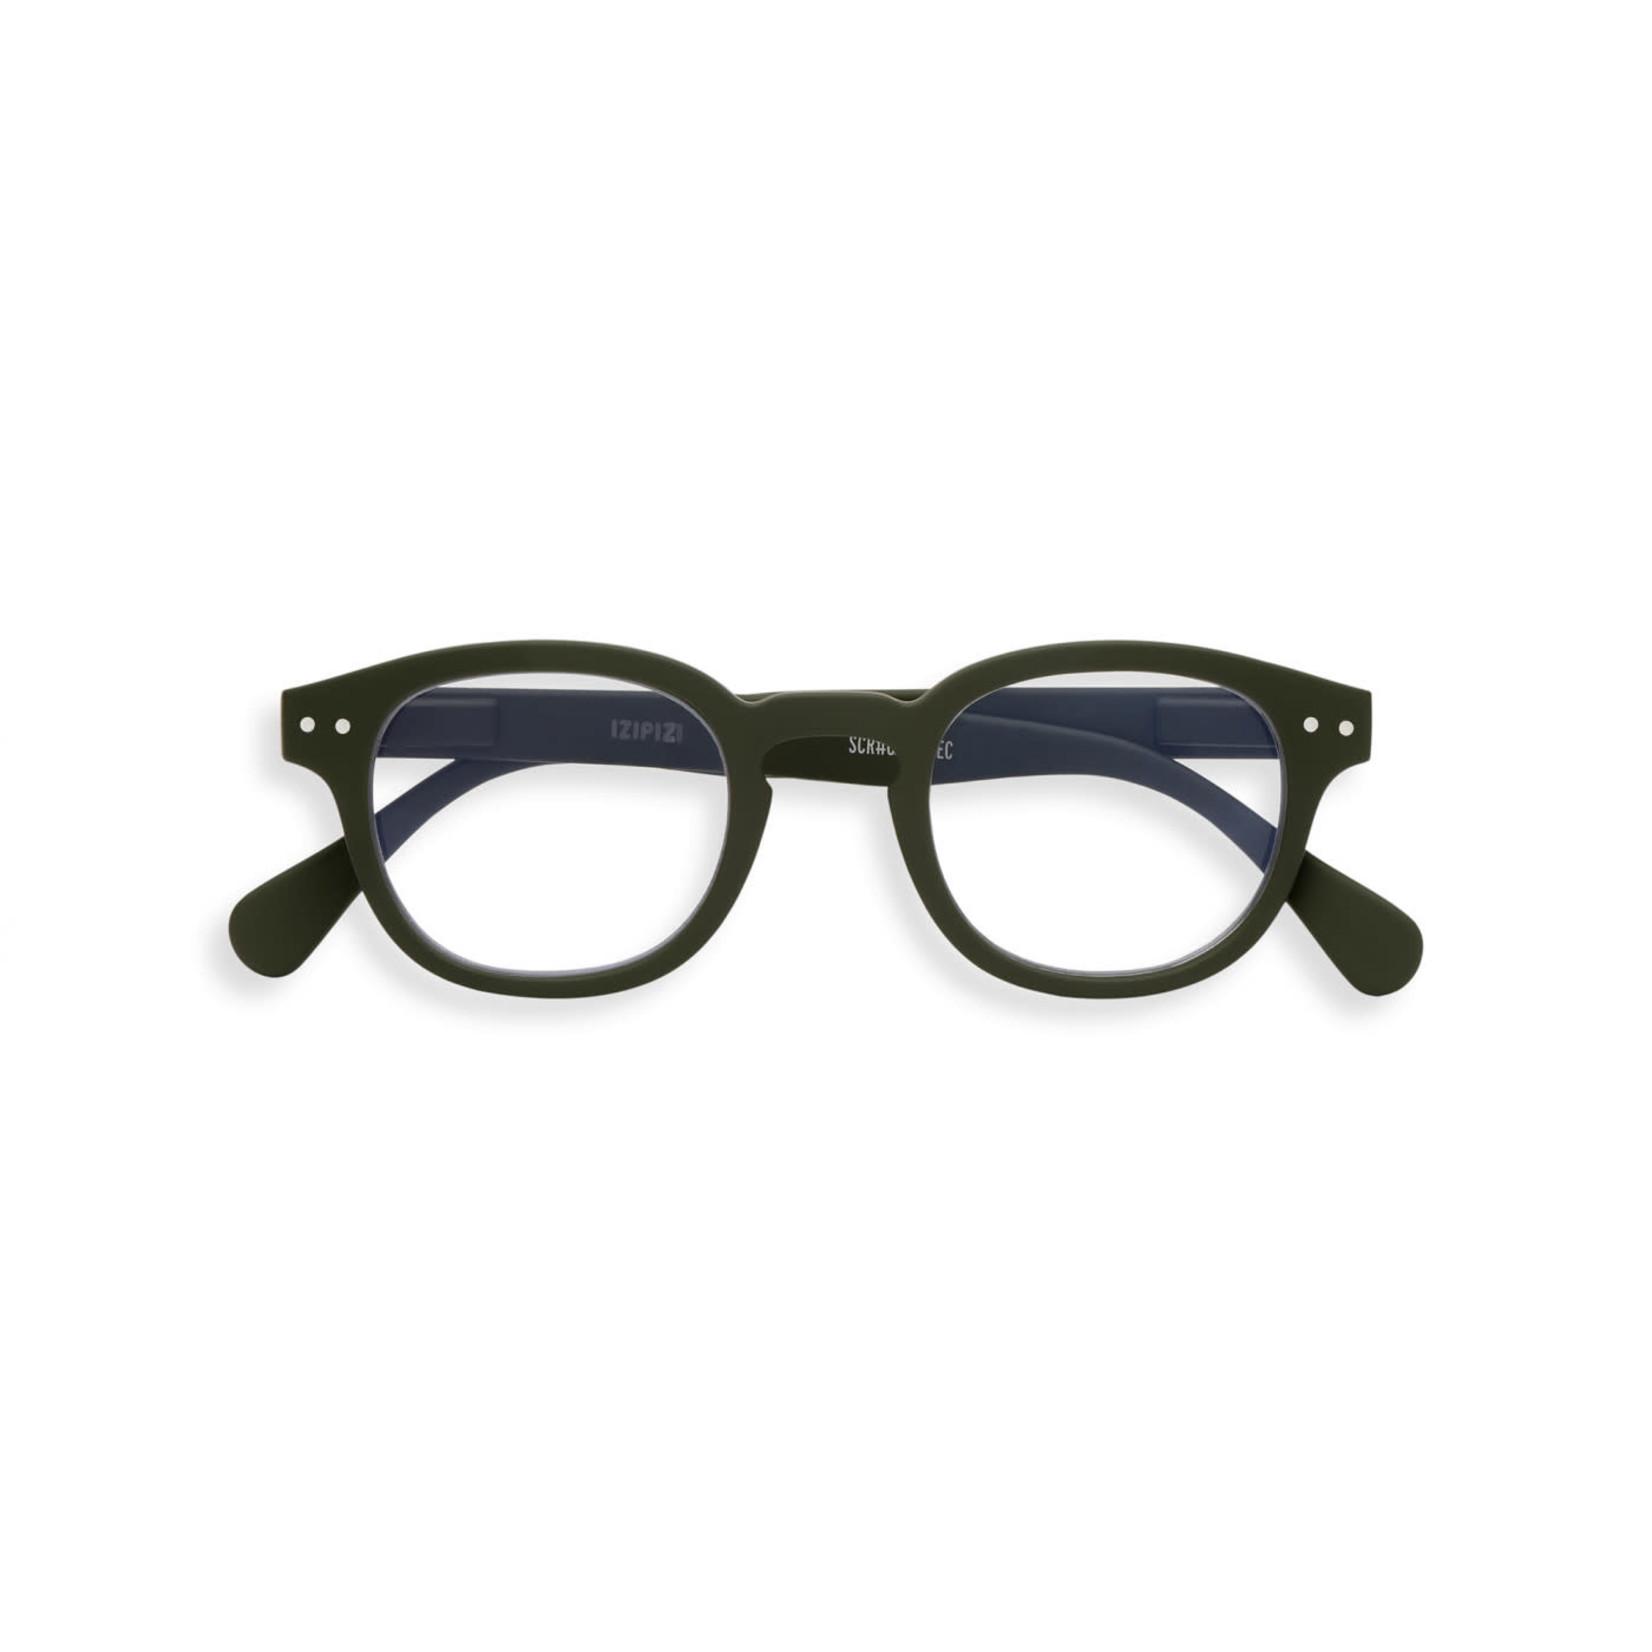 IZIPIZI Izipizi Screen Glasses C Retro  Khaki Green